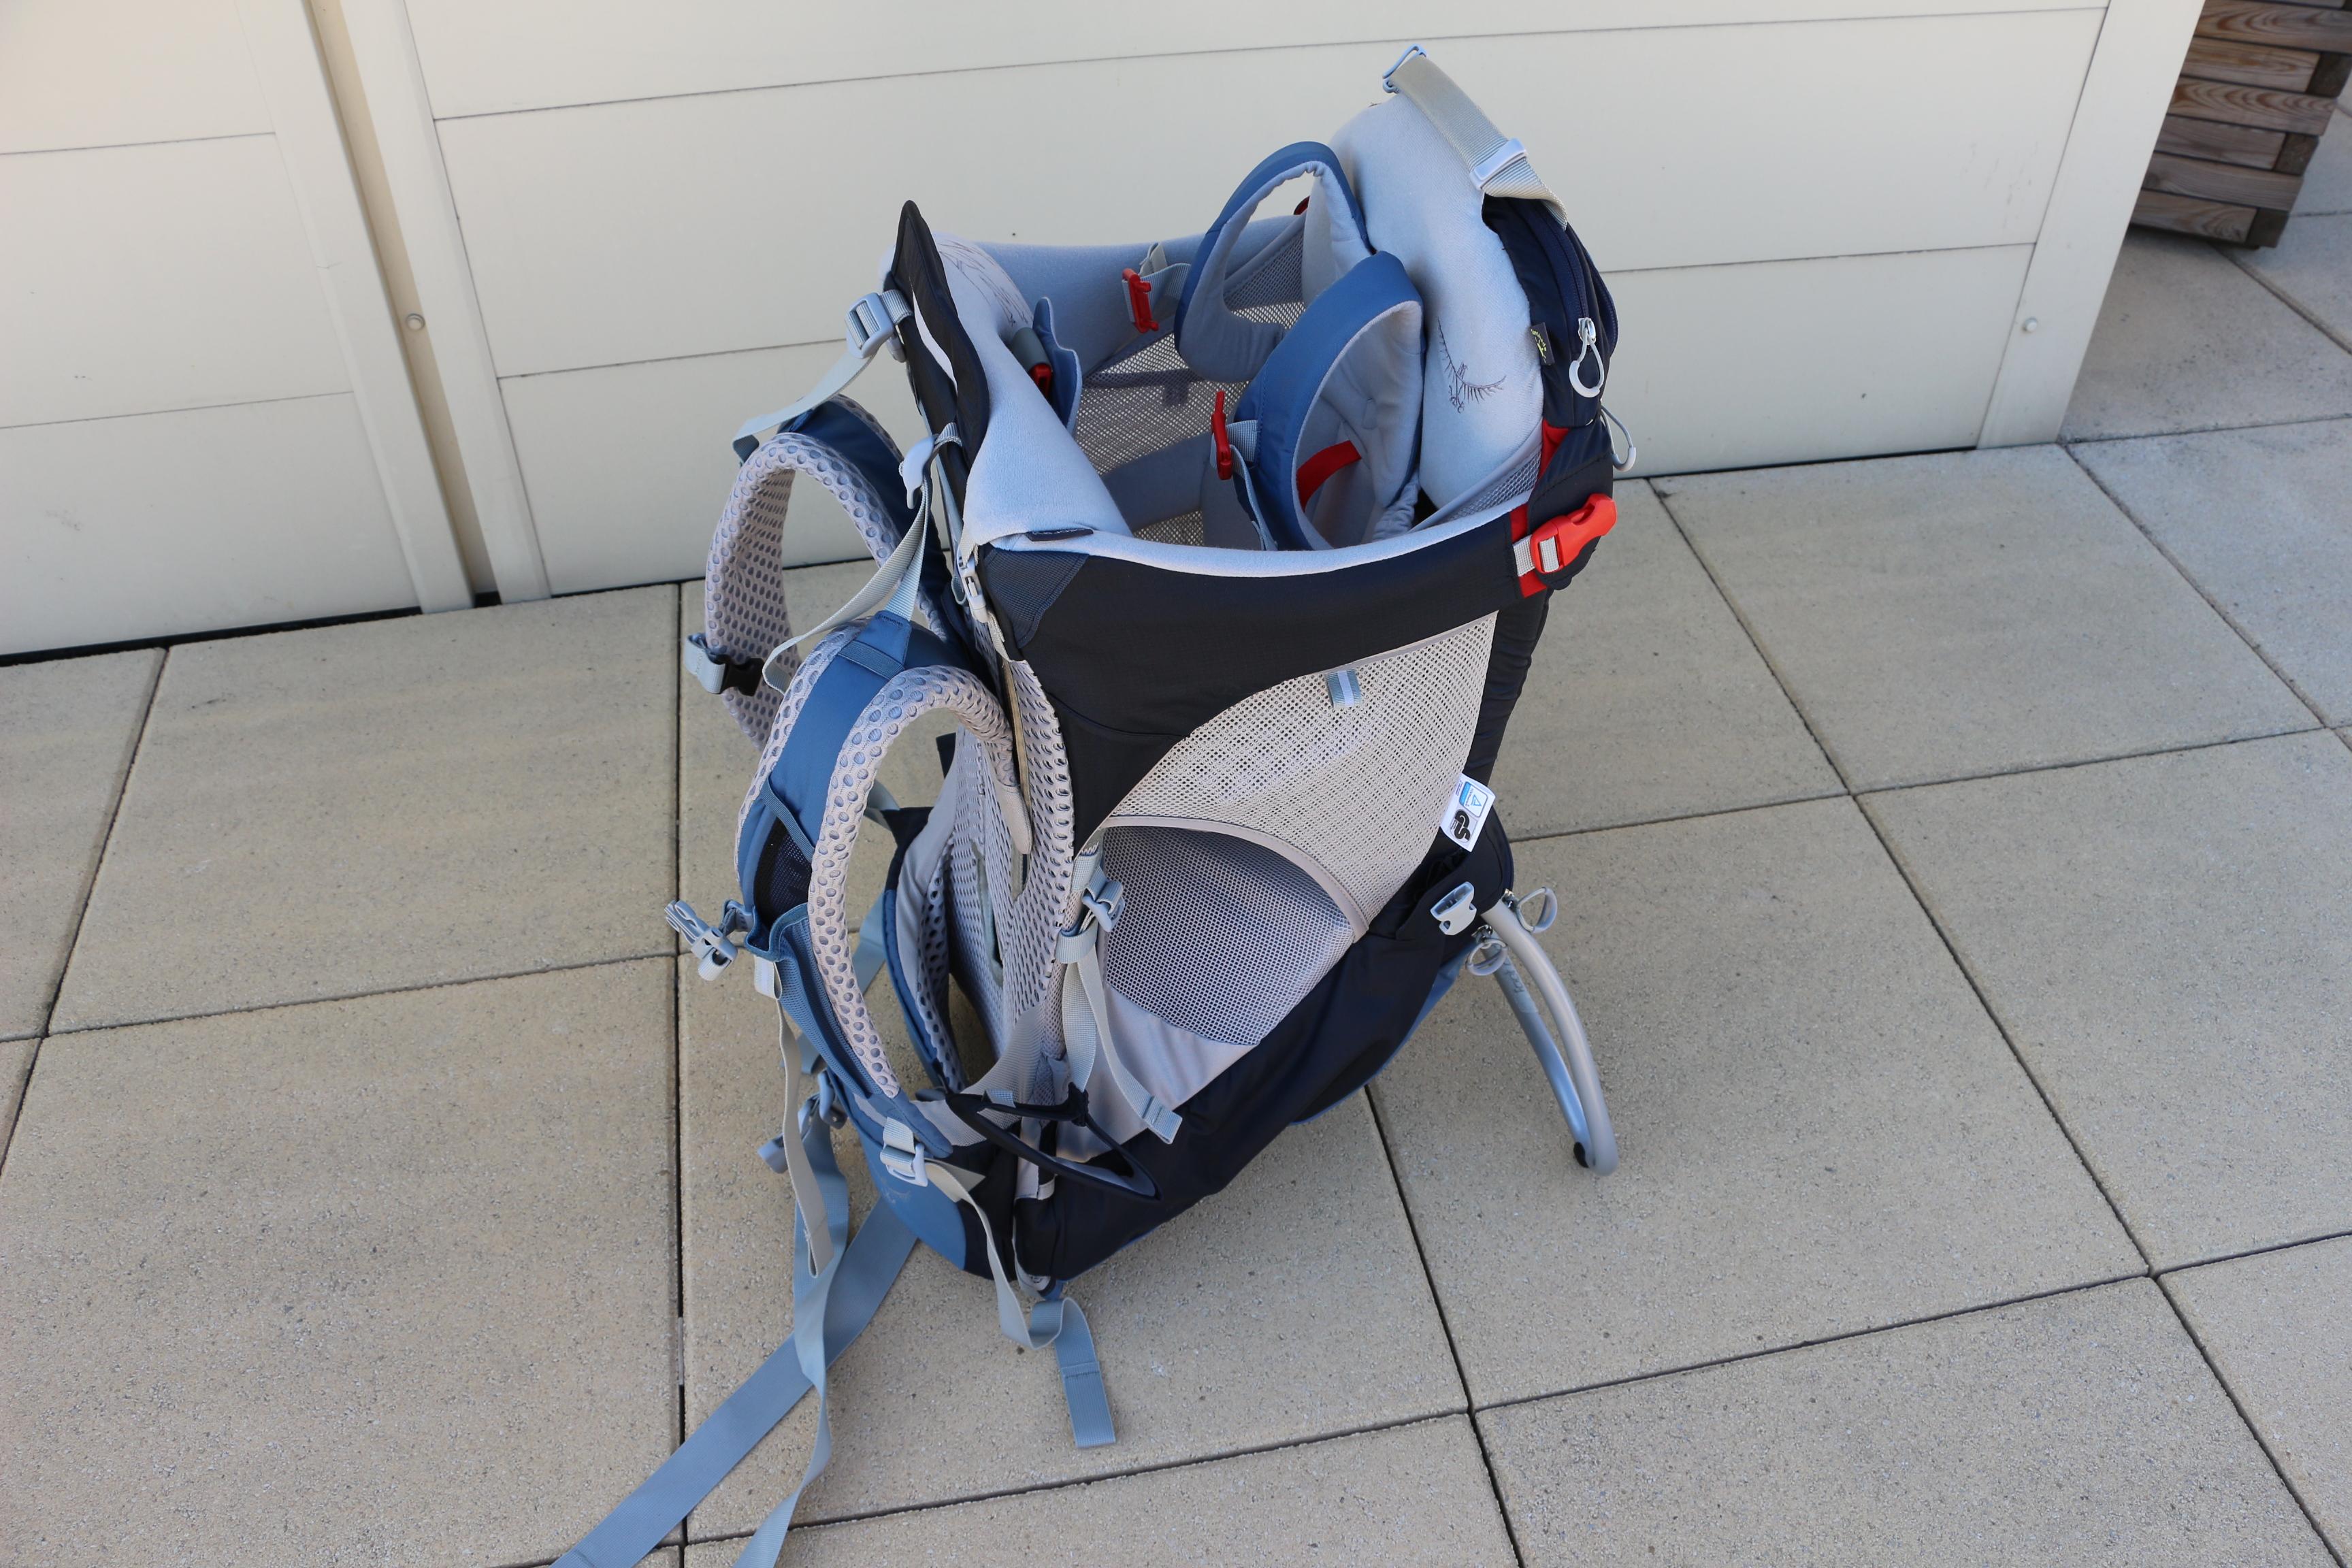 porte-bebe de randonnee osprey cote